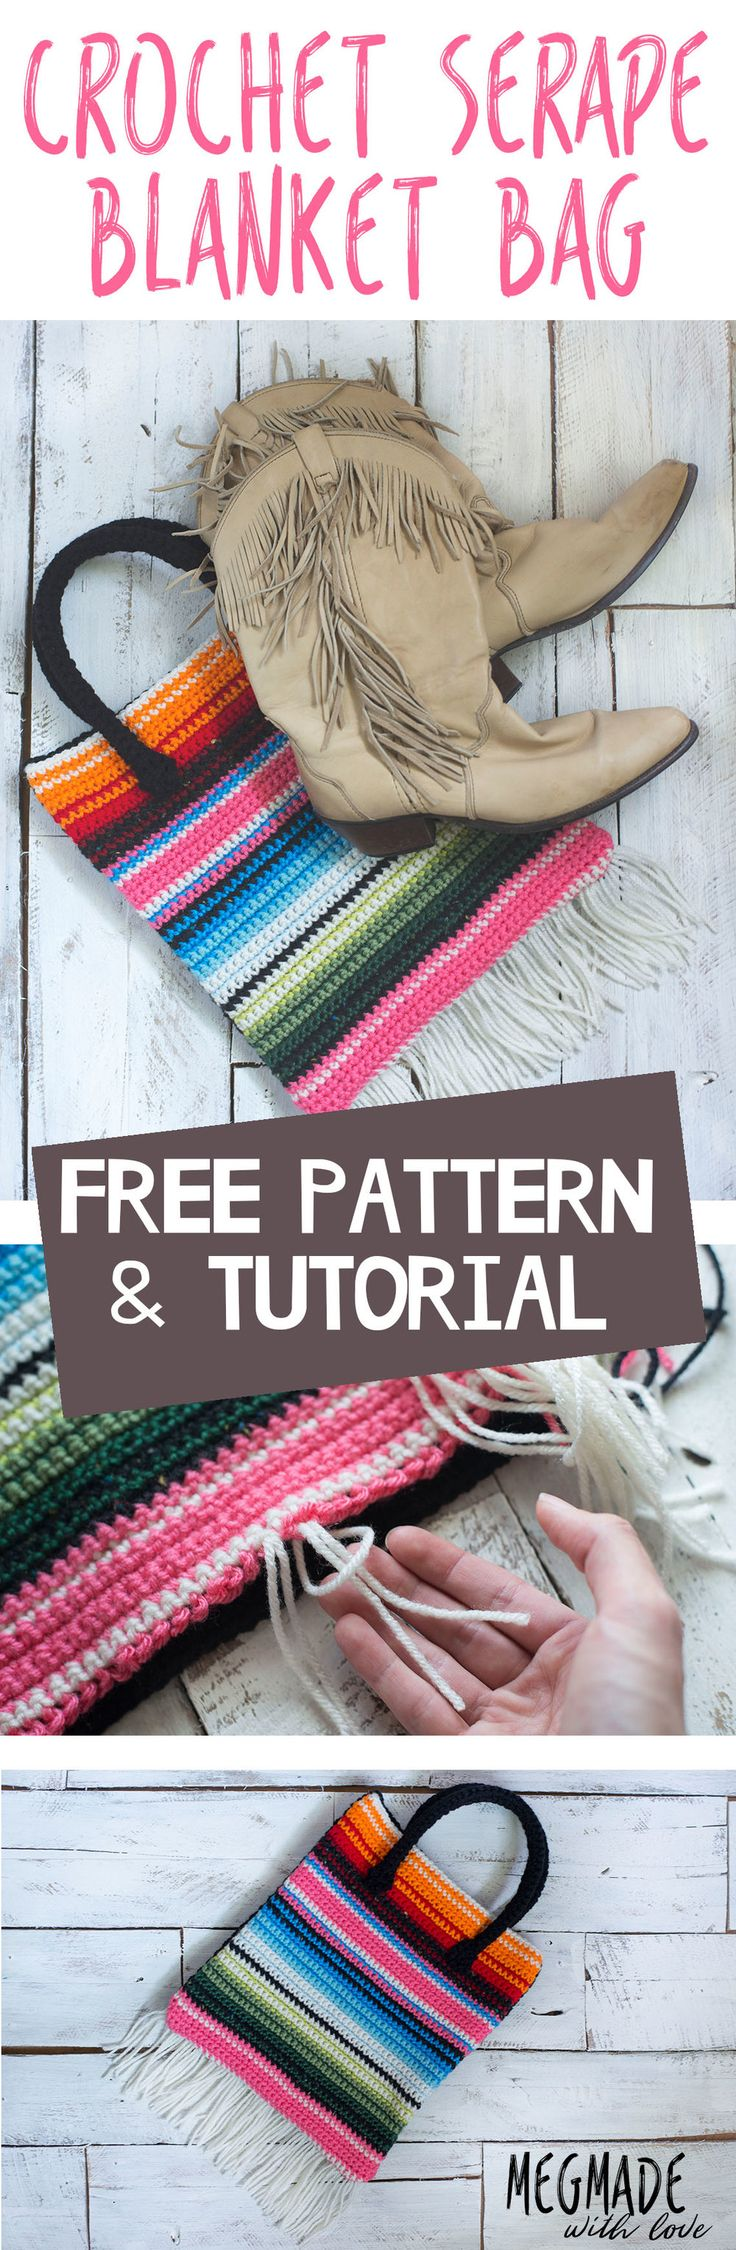 Crochet Serape Blanket Bag Pattern — Megmade with Love